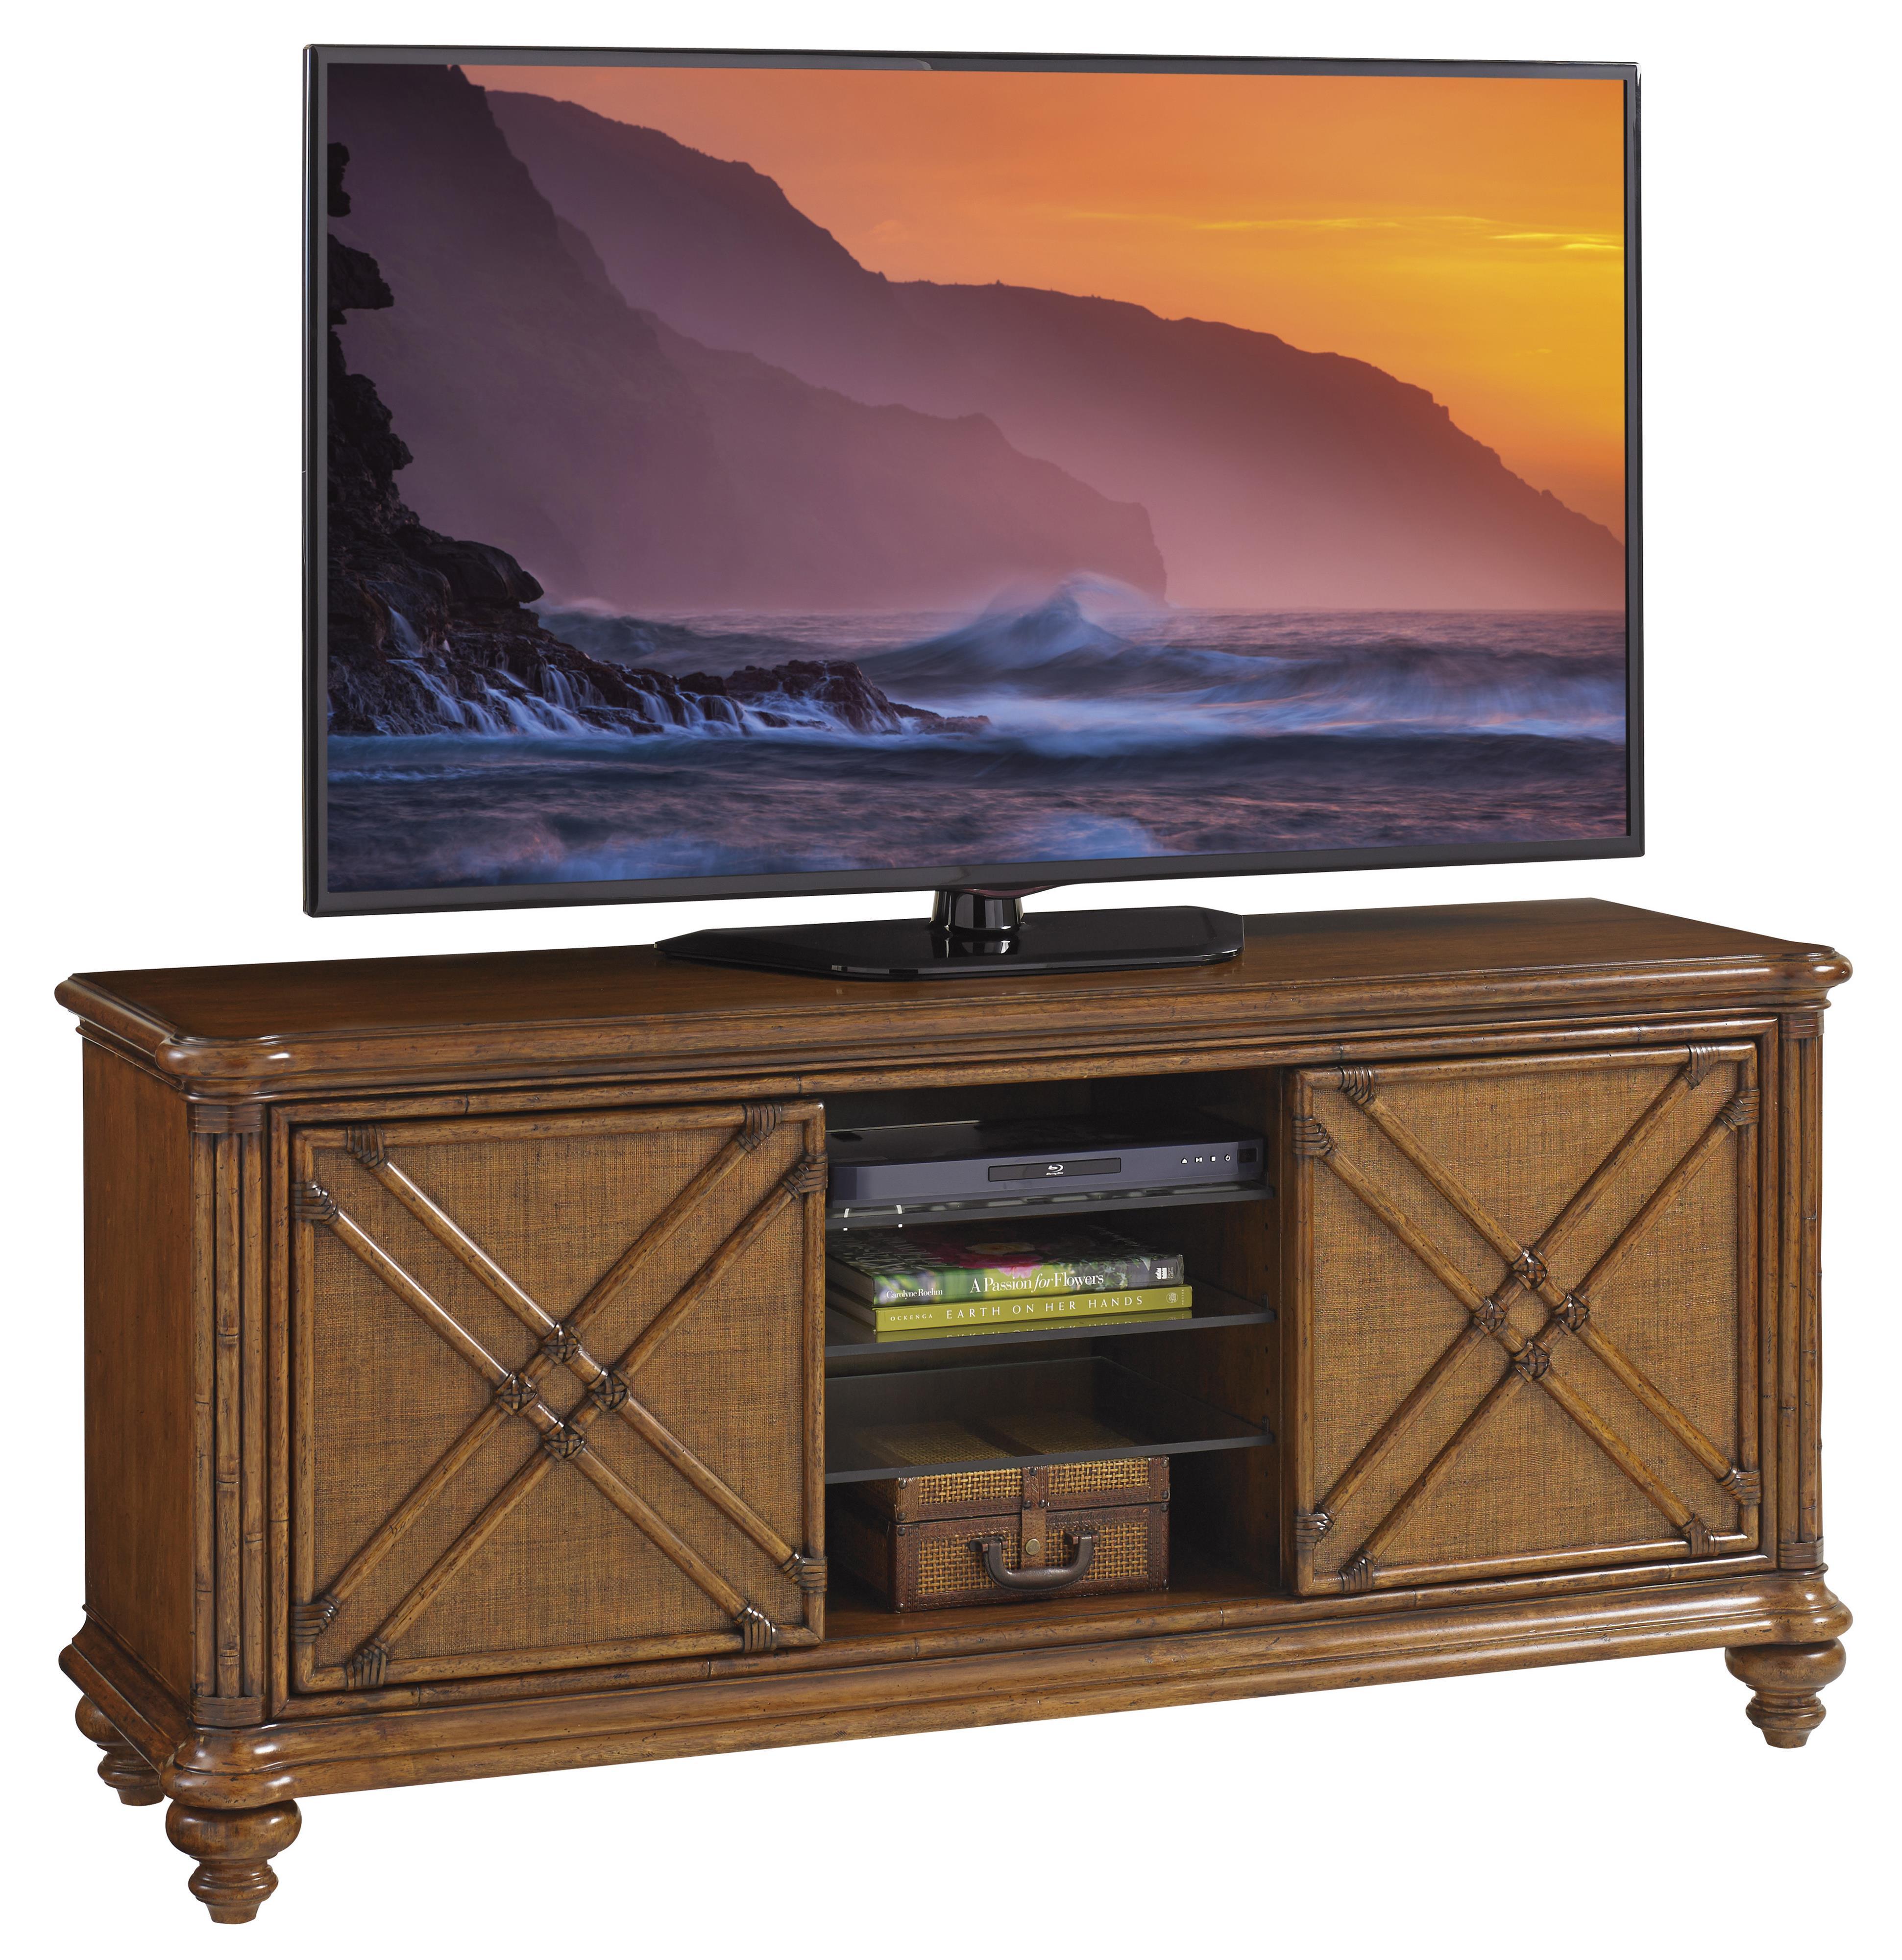 Bali Hai Marlin Media Console by Tommy Bahama Home at Baer's Furniture